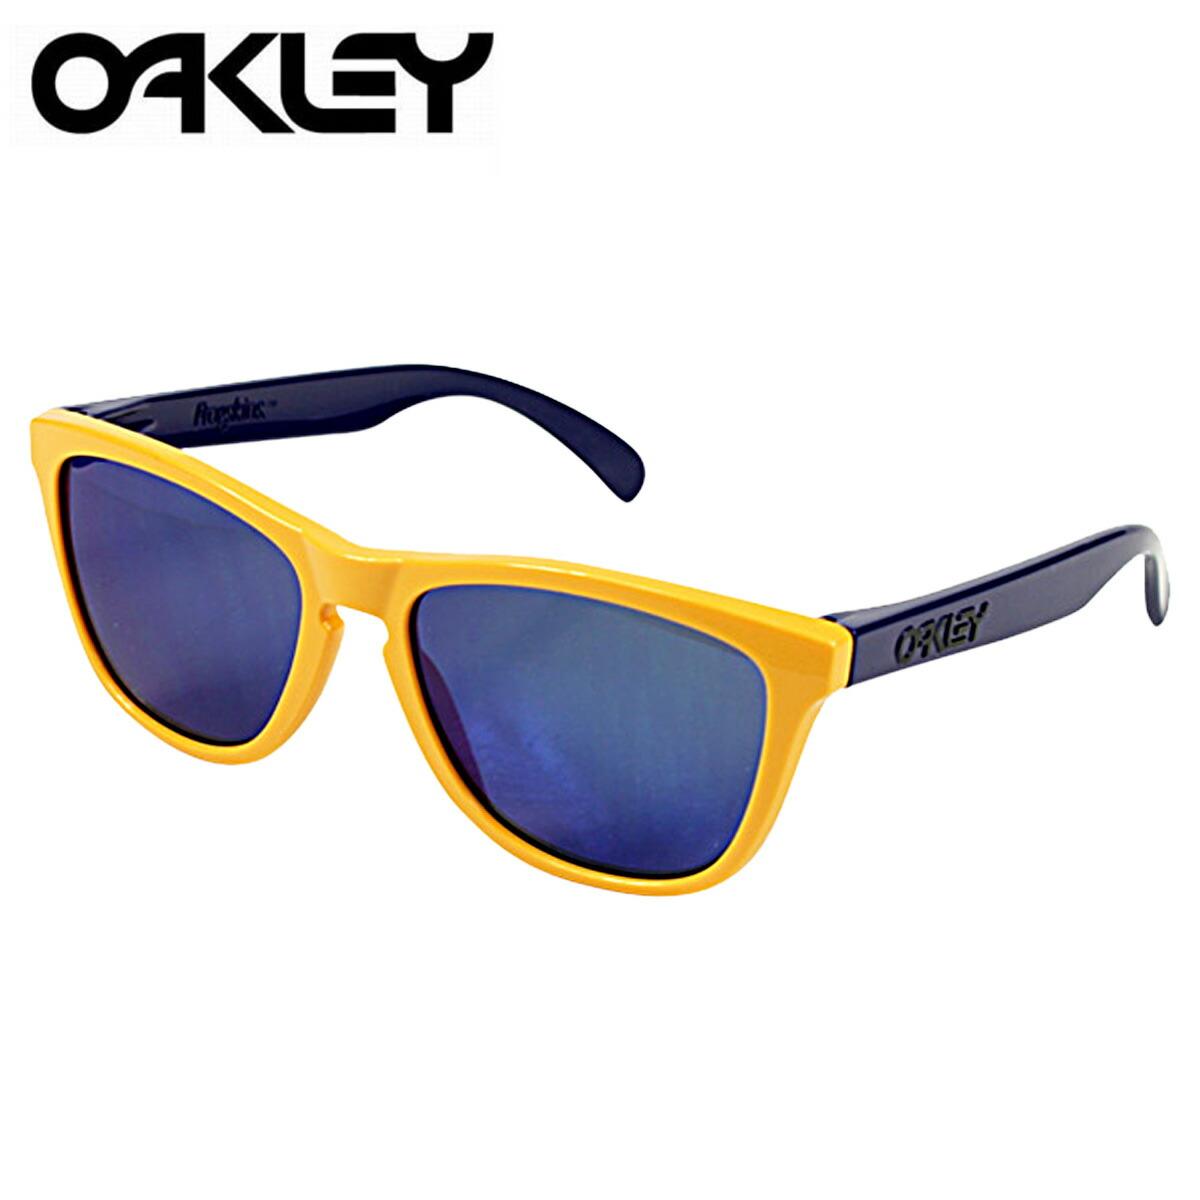 womens blue oakley sunglasses  oakley oakley sunglasses frogskins frog skin mens womens glasses 24 362 drop off x blue iridium collection aquatique unisex